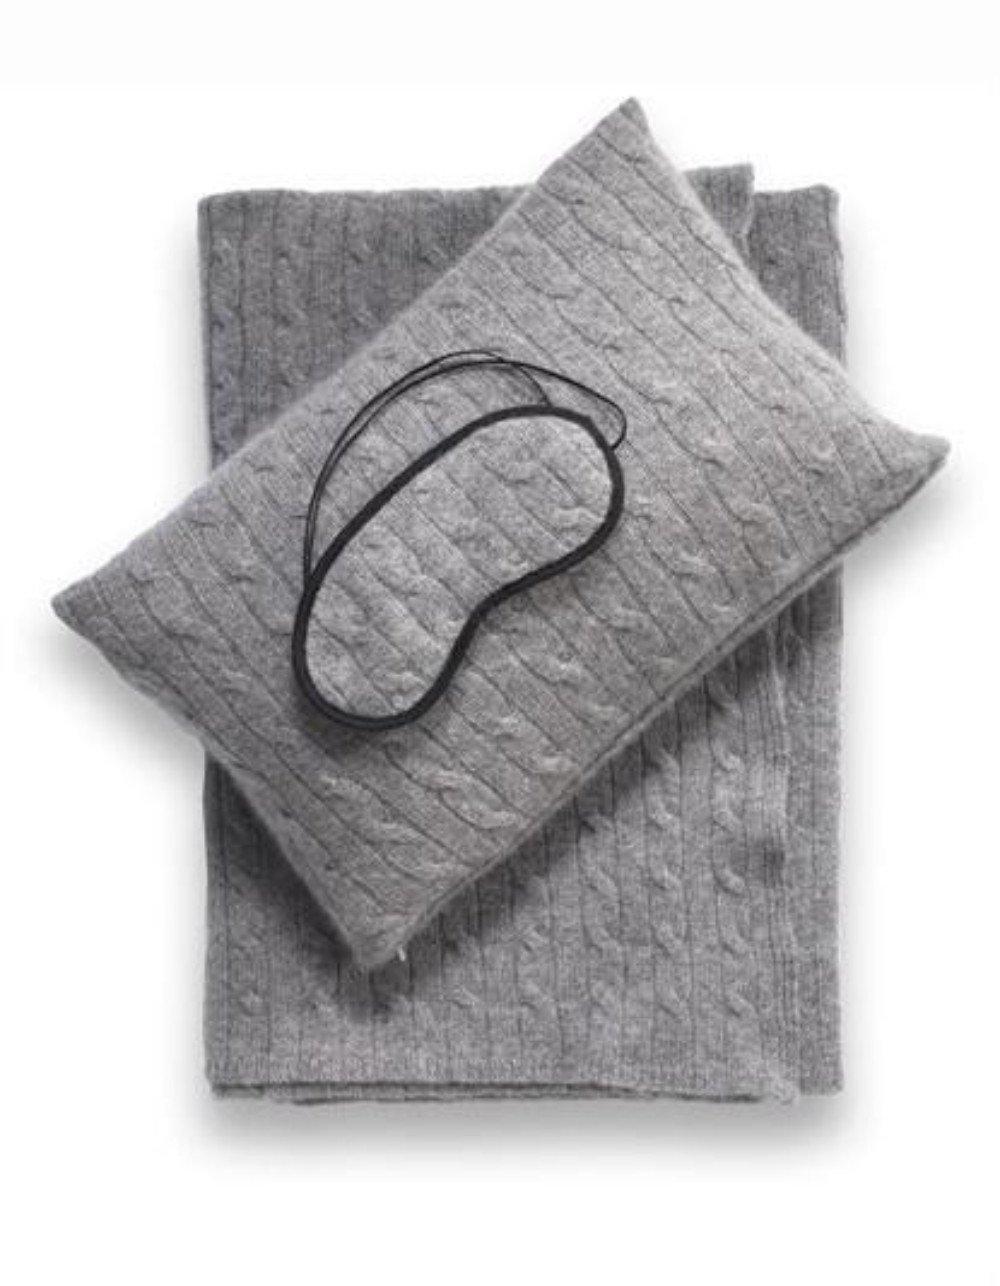 Emilia Cashmere Travel Blanket | Cashmere Travel Blankets, Sofia Cashmere blankets